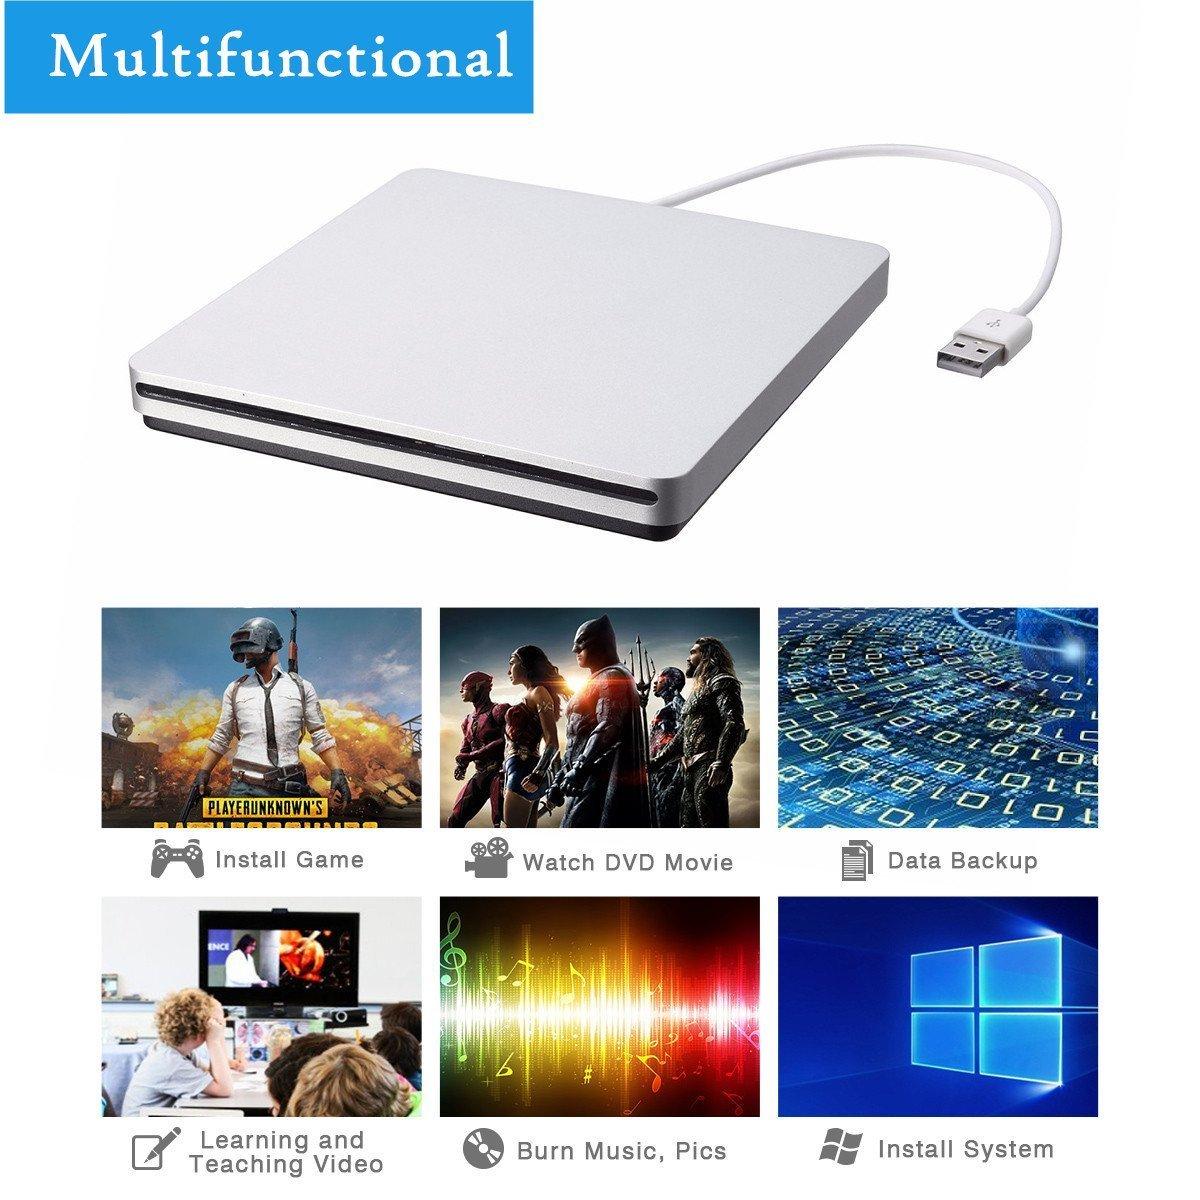 External CD DVD Drive,ONCHOICE USB 2.0 External Disc Optical Drive, Slim CD/DVD-RW Writer Player Burner for Windows OS, Laptop Desktop PC by ONCHOICE (Image #3)